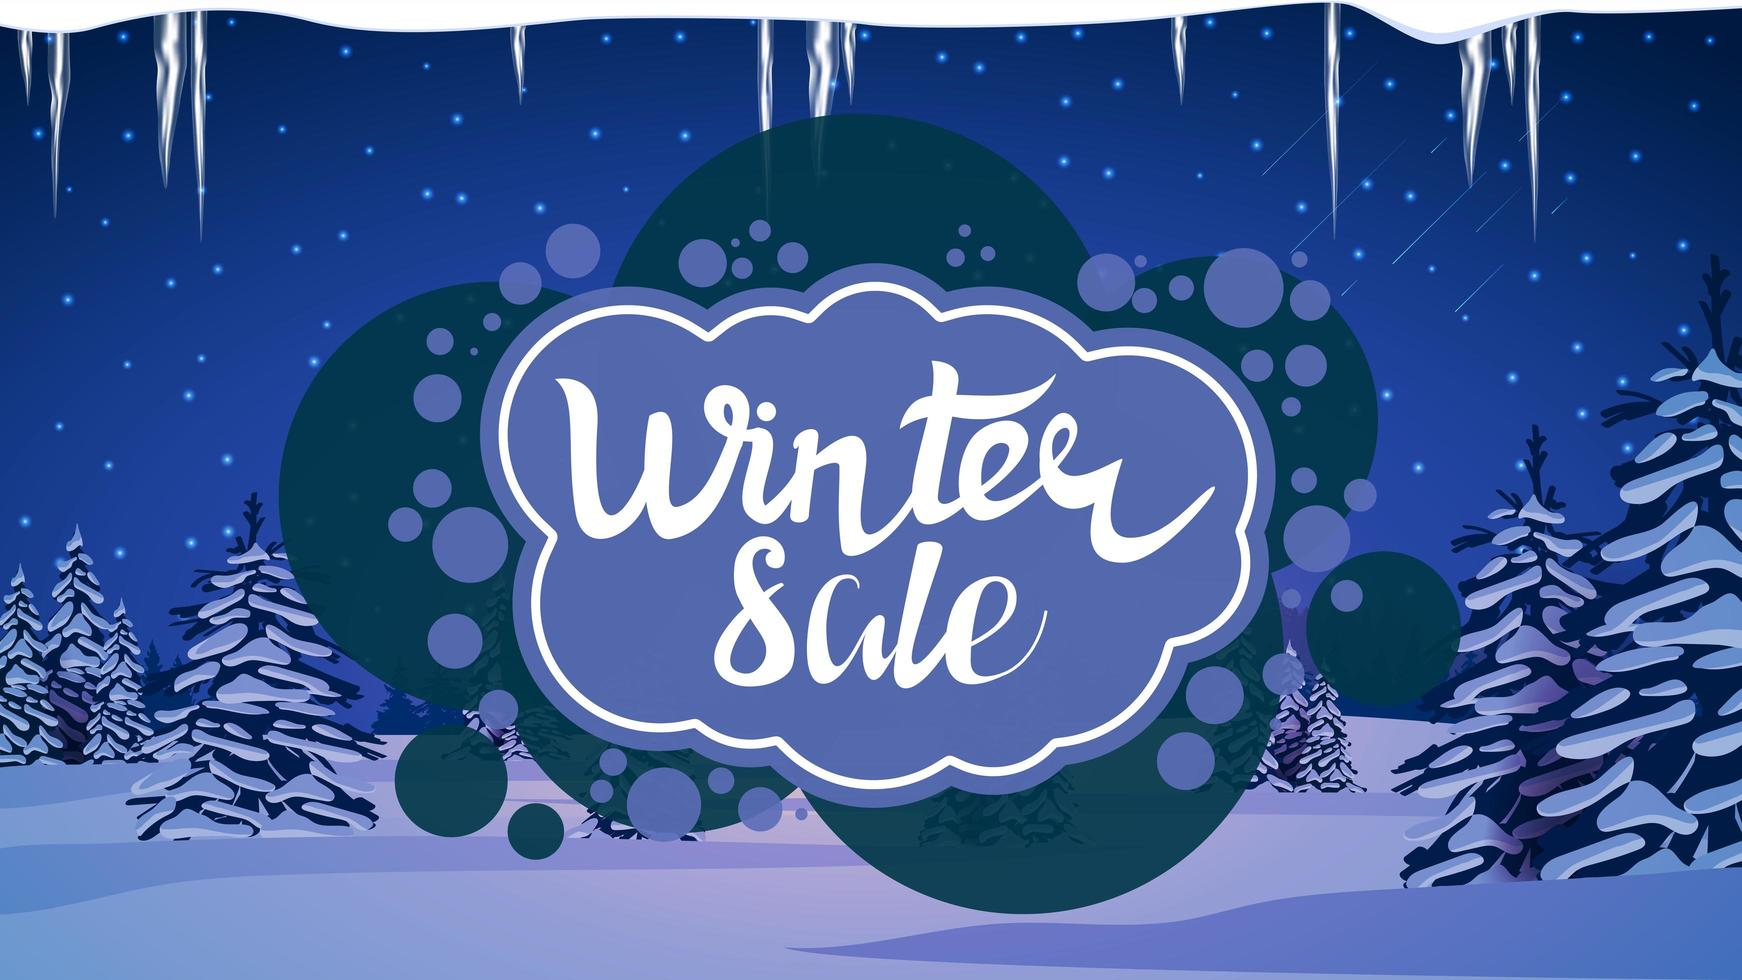 venta de invierno, banner de descuento azul moderno vector